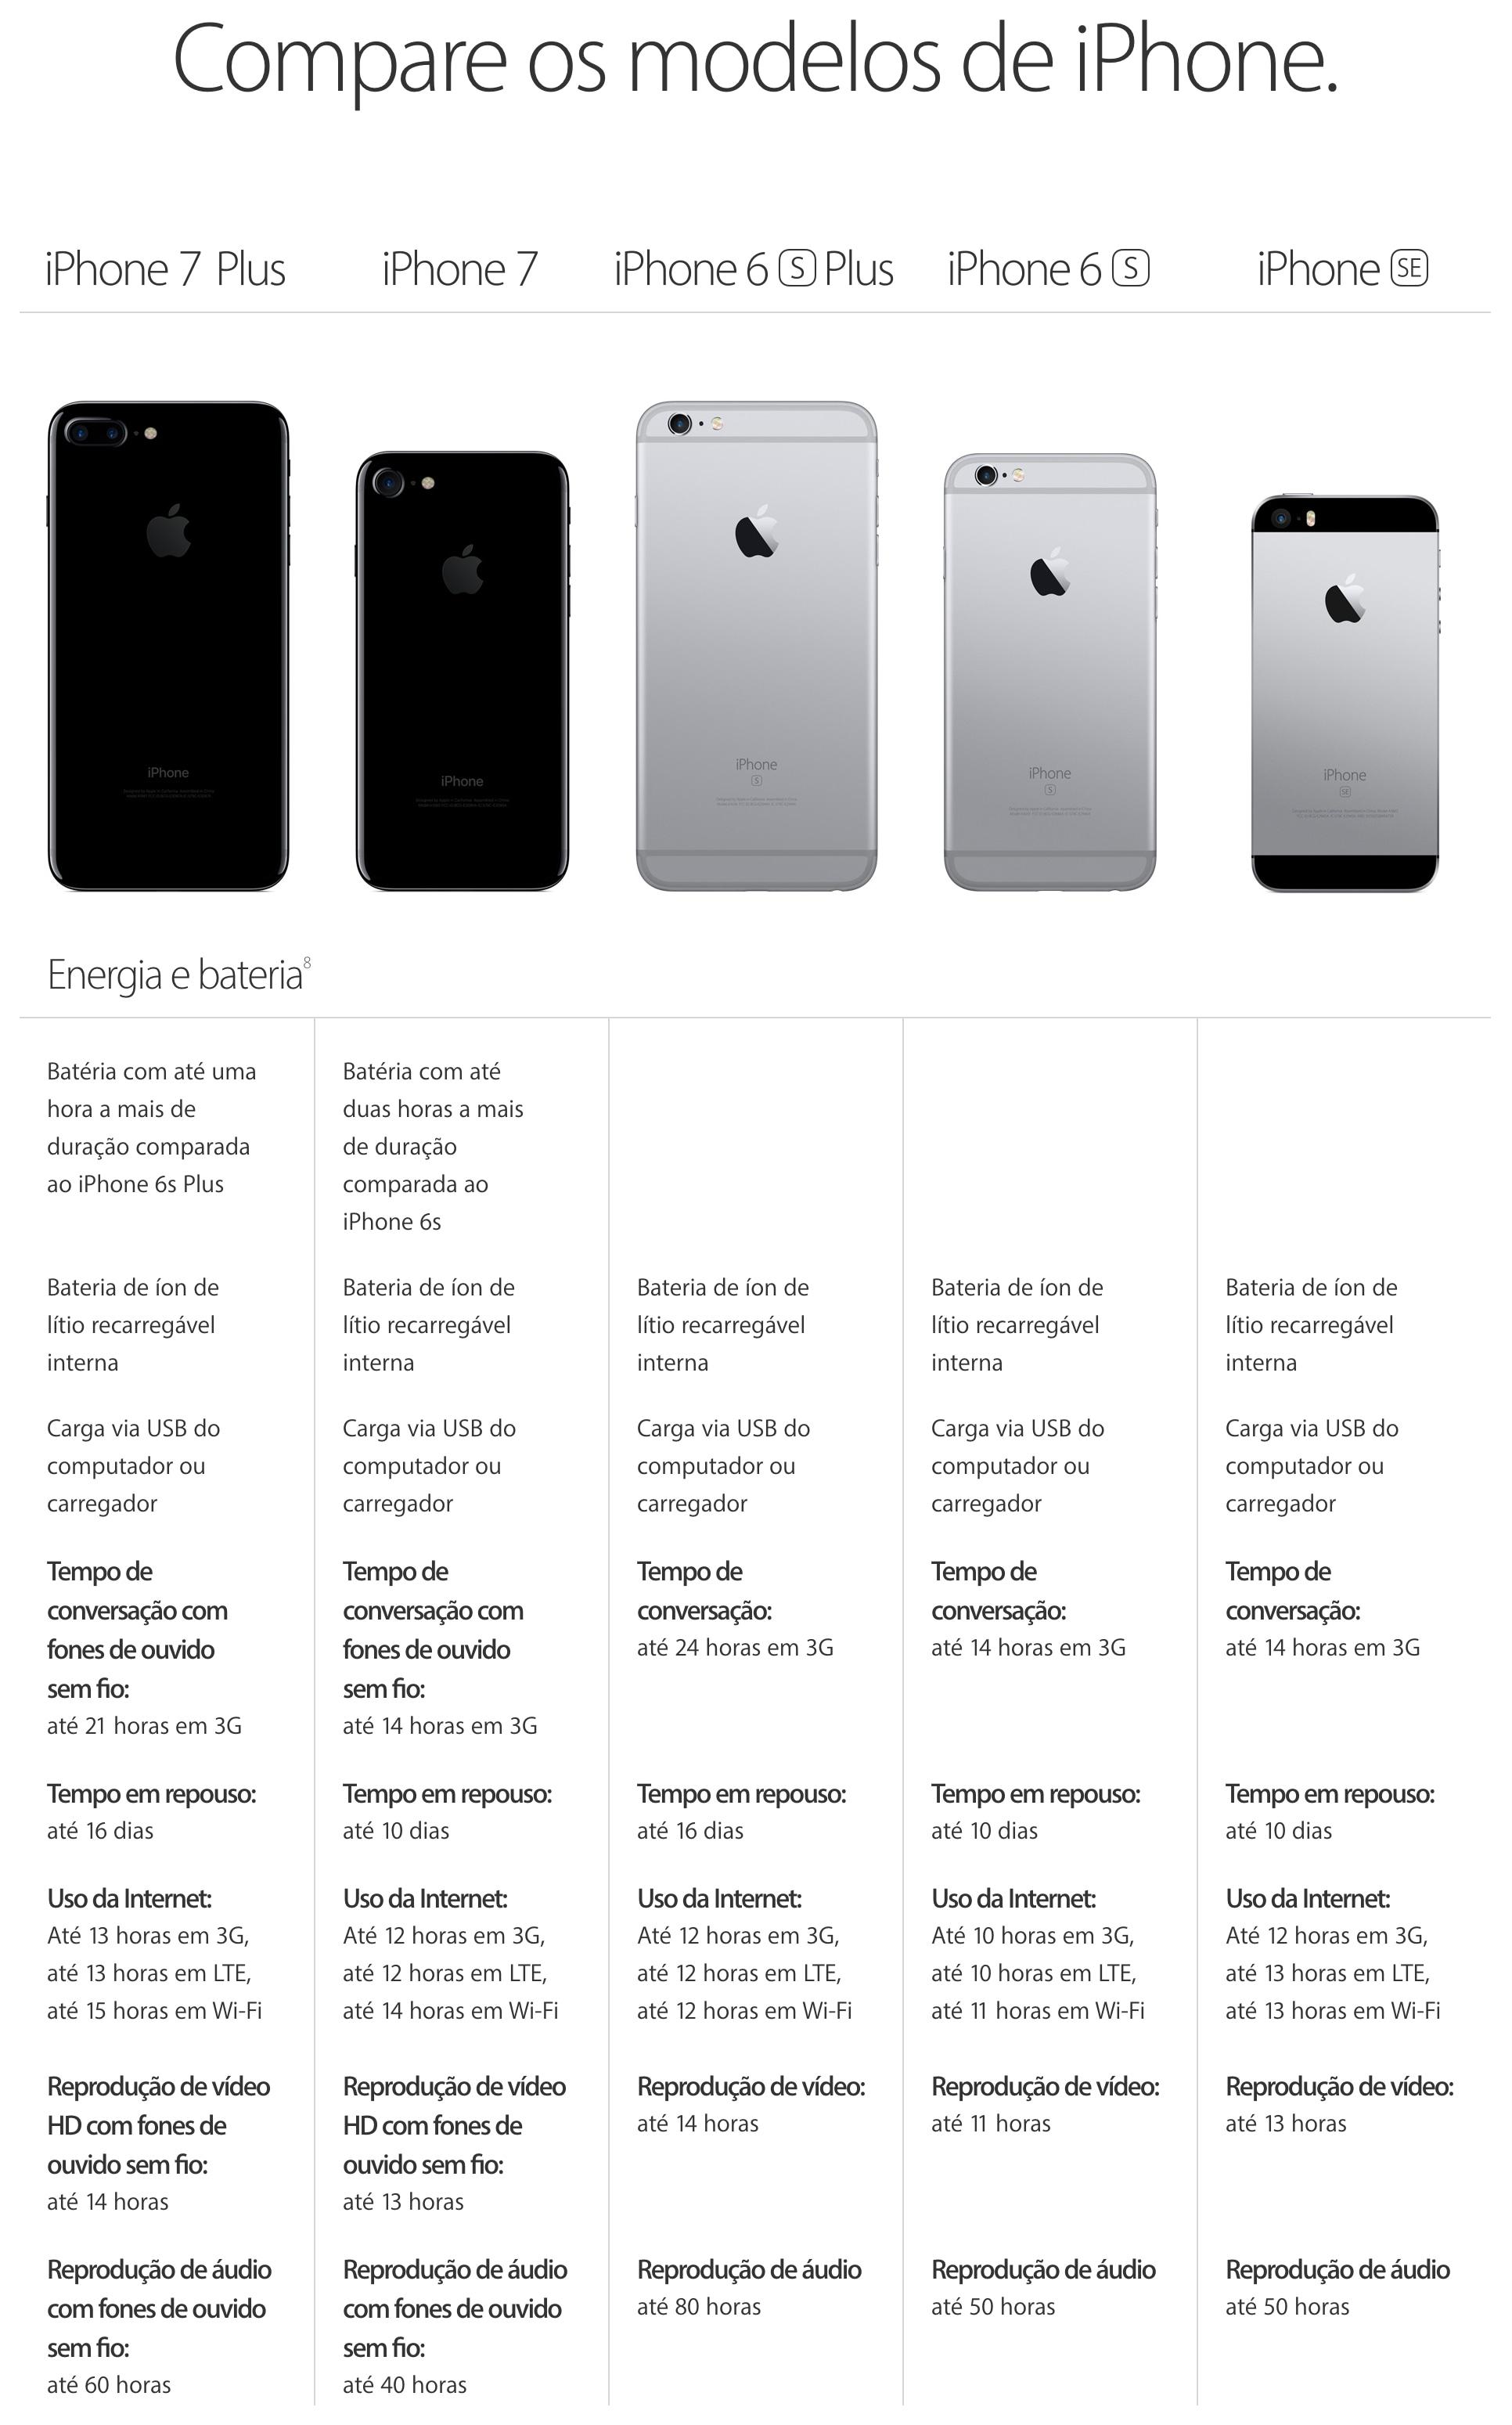 Comparativo de baterias dos iPhones